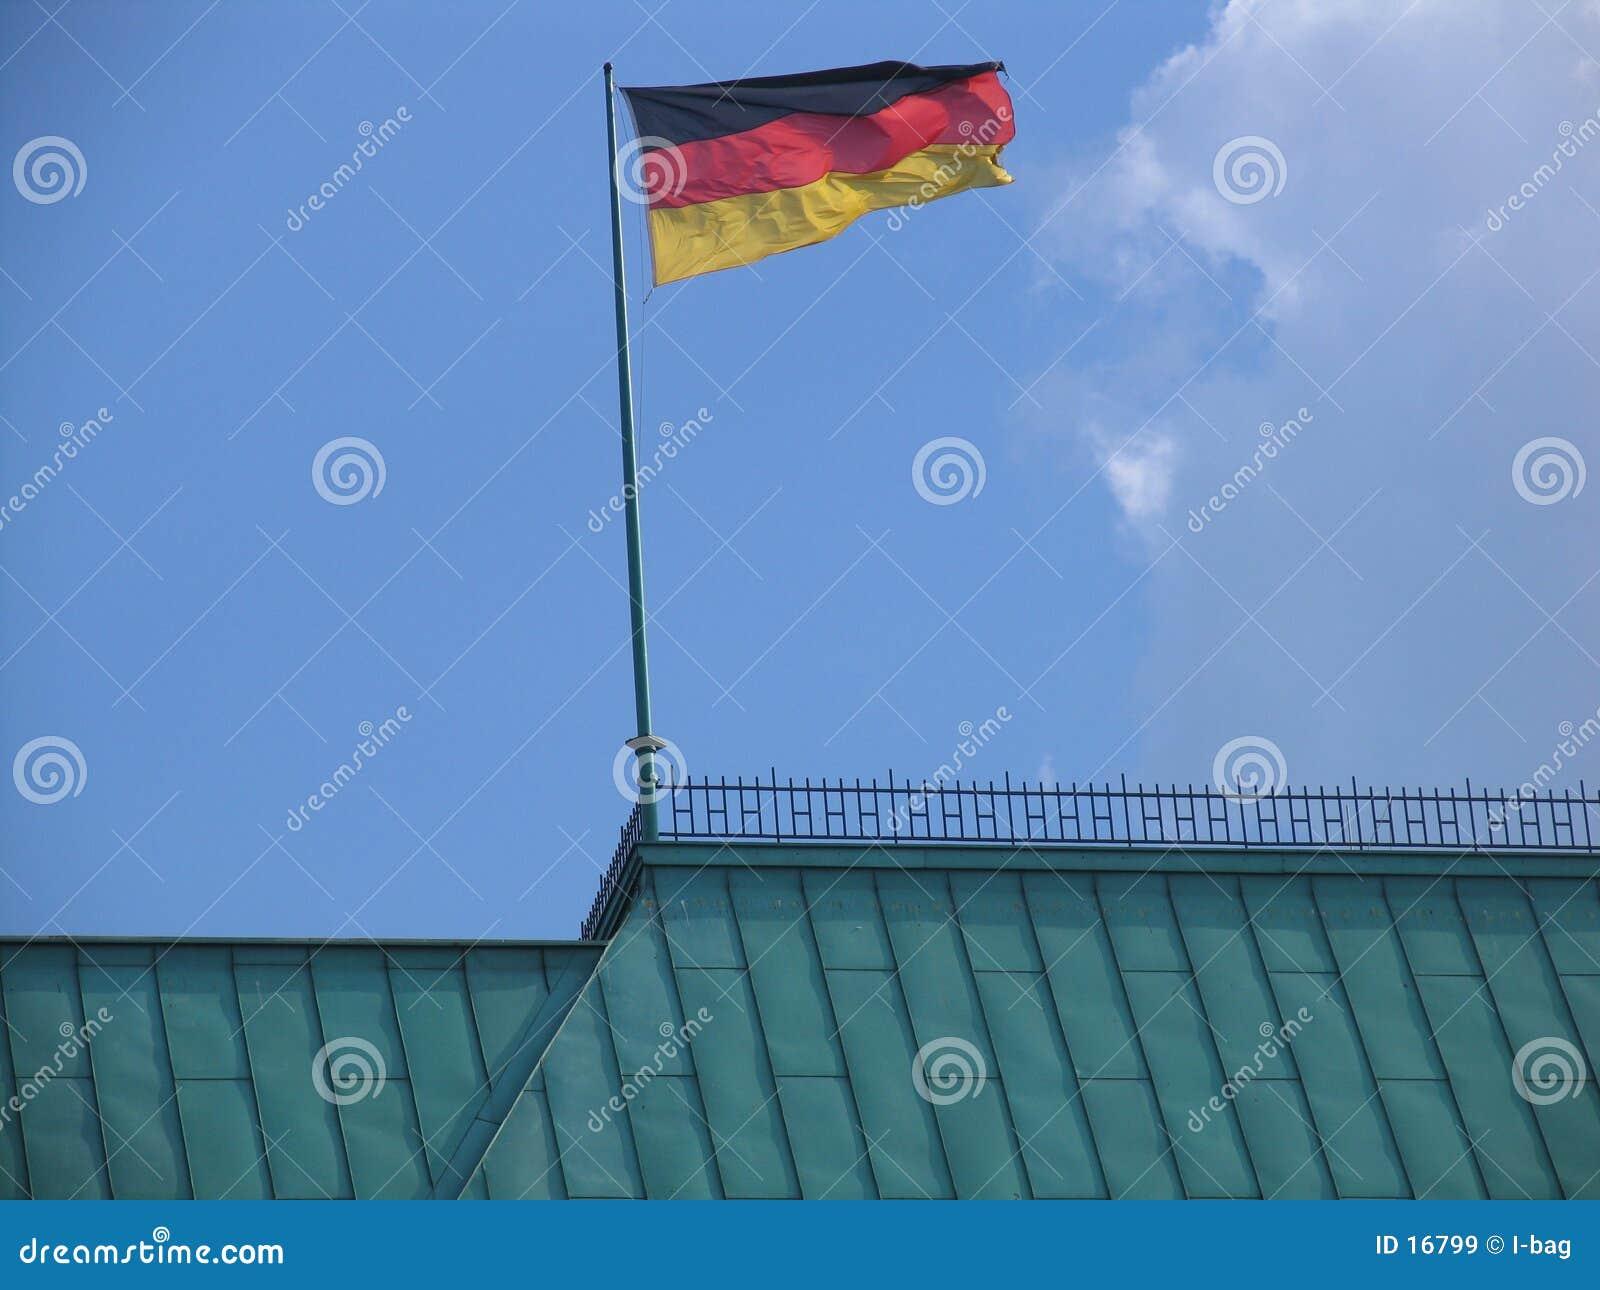 Flagg niemcy